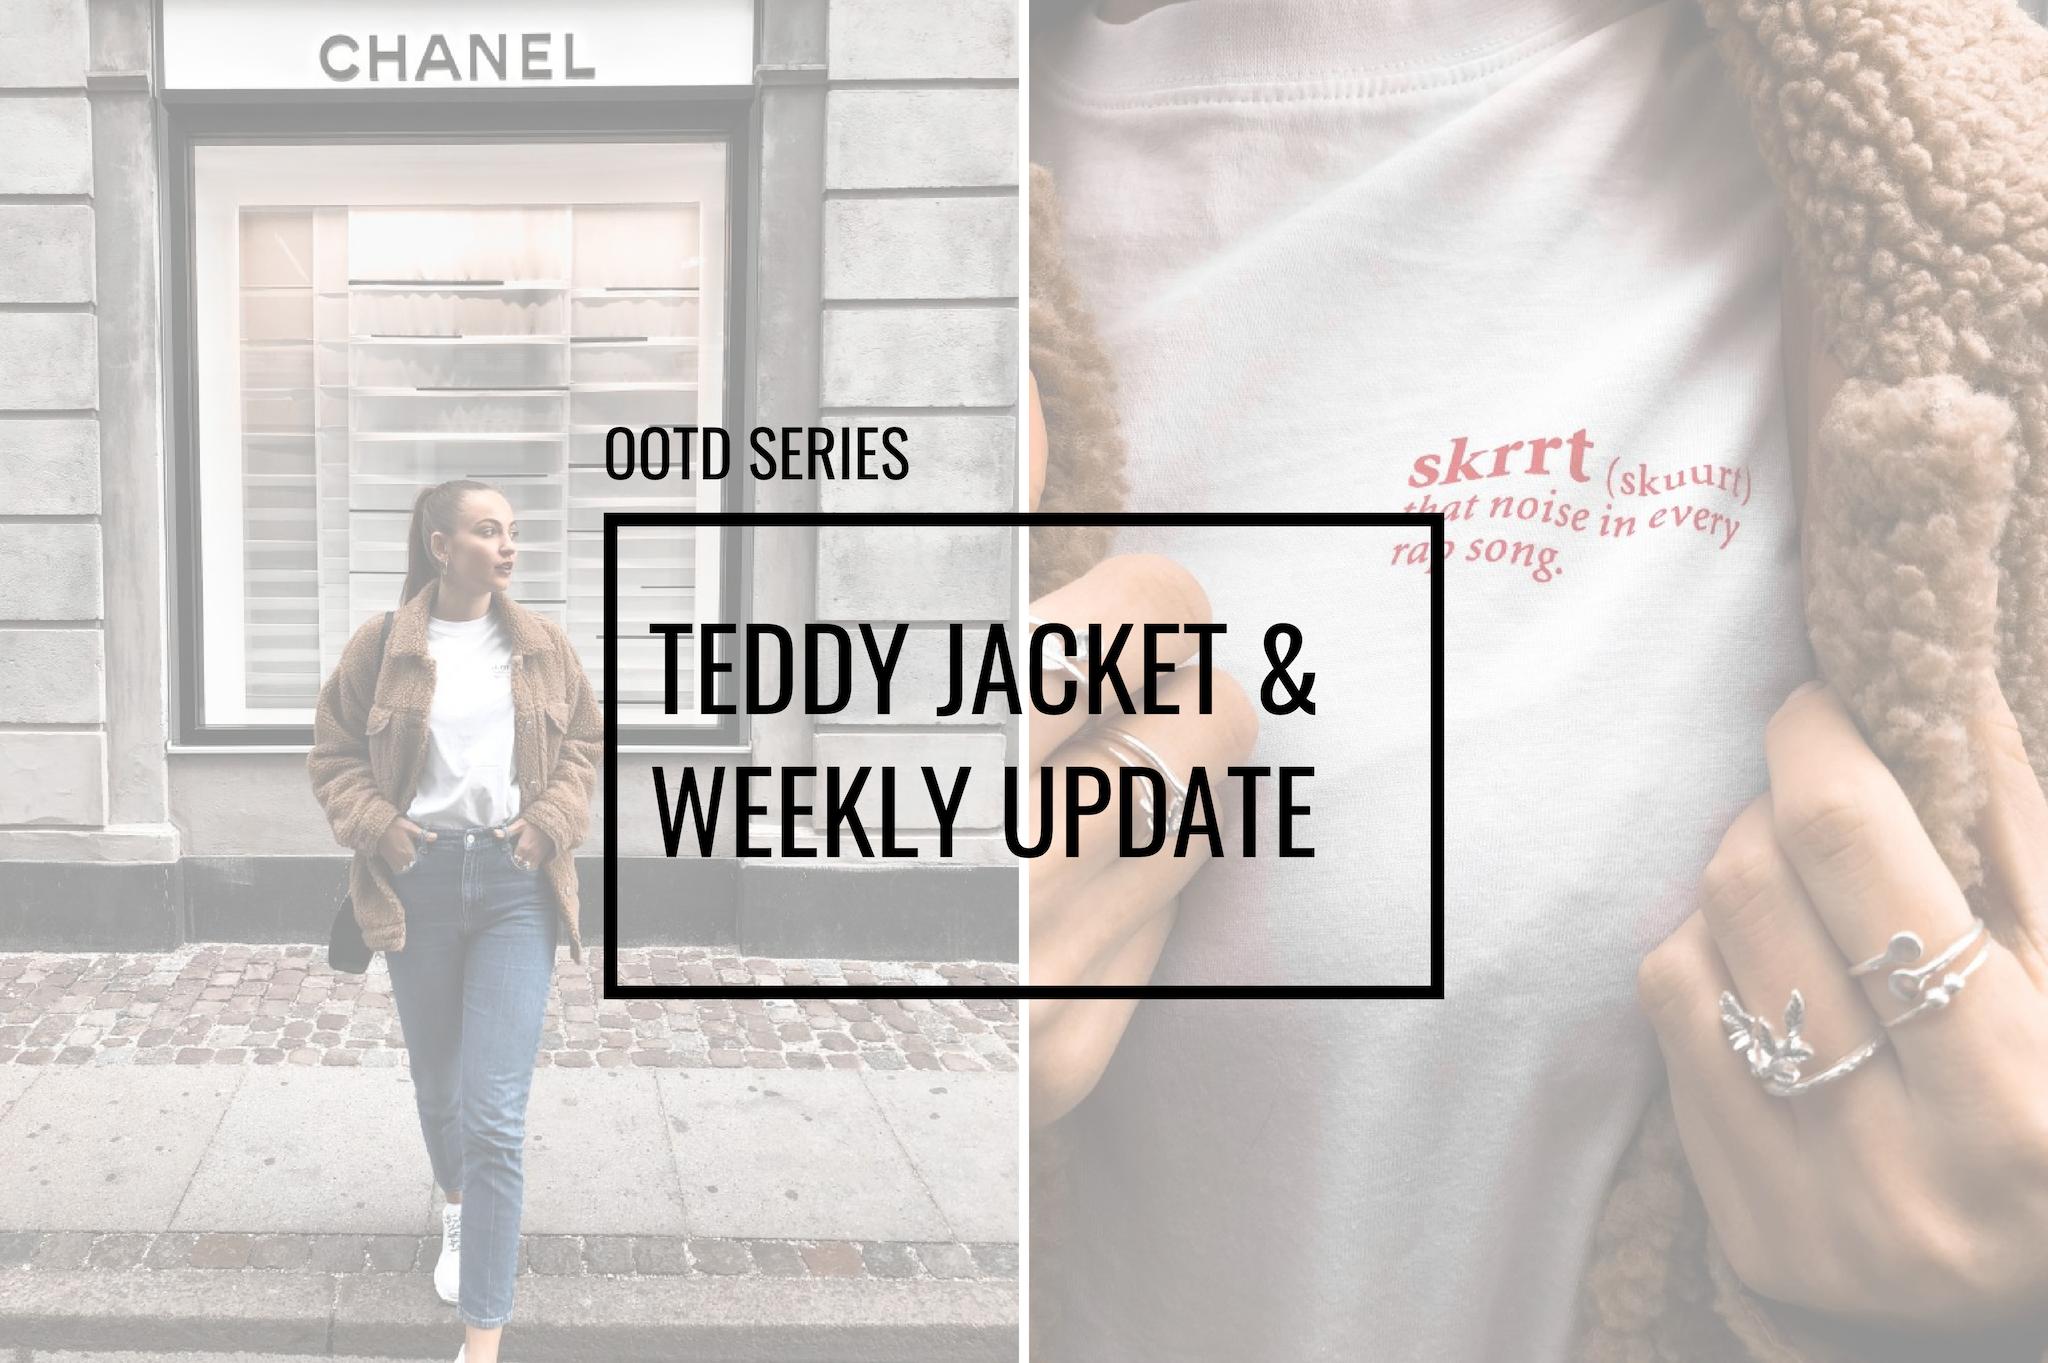 teddy jacket ootd snipes tshirt skrrt white tshirt look jeans denim style of the day fashion inspo